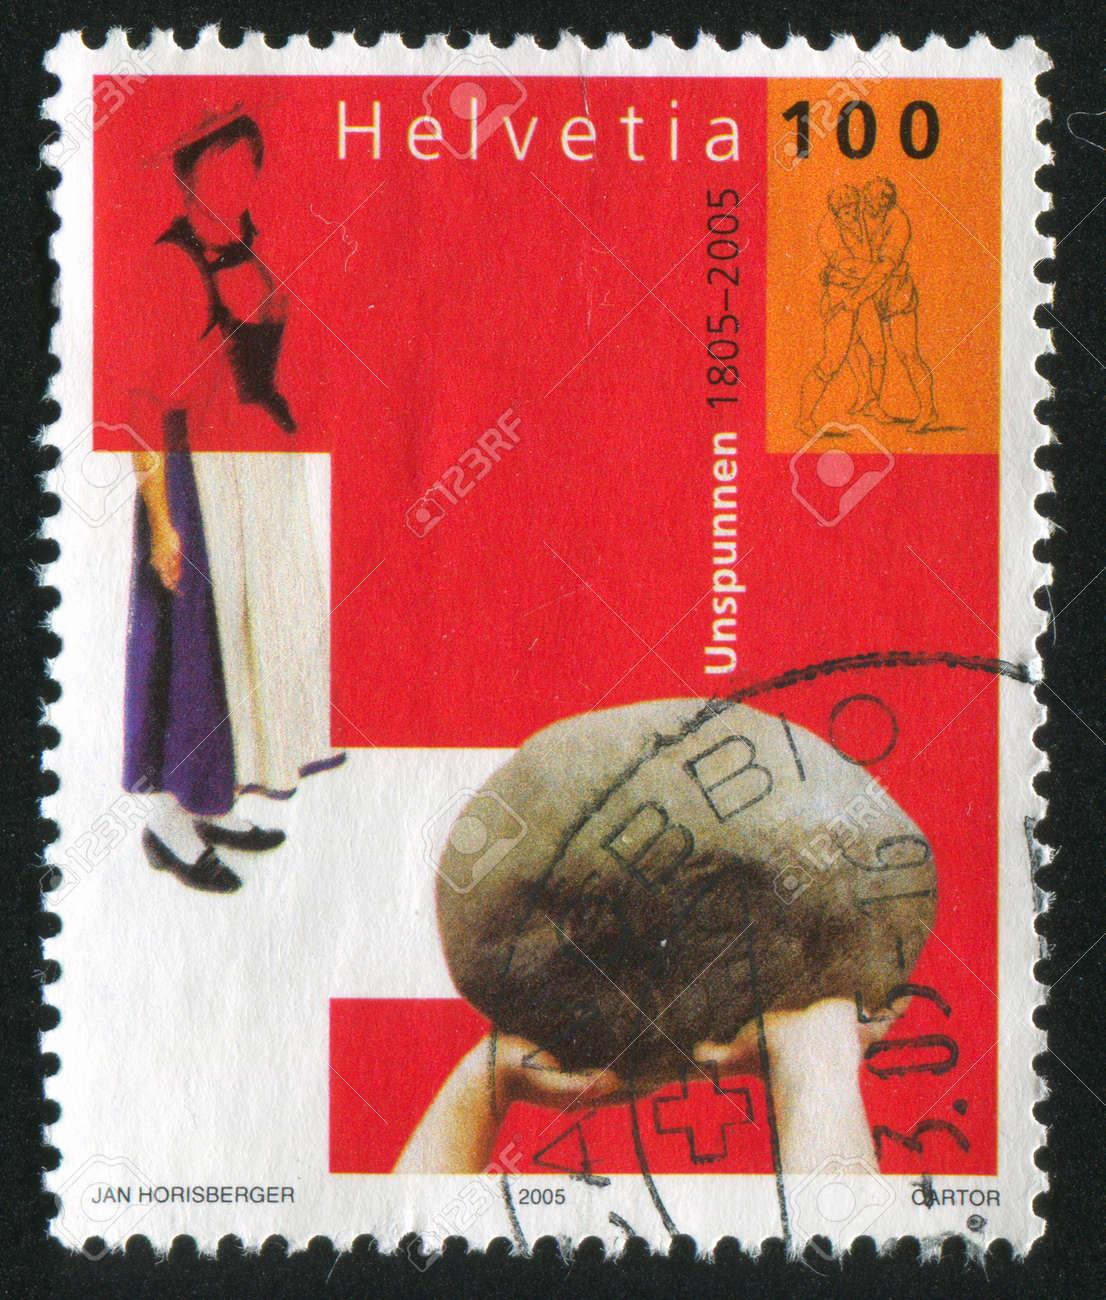 SWITZERLAND - CIRCA 2005: stamp printed by Switzerland, shows Unspunnen traditional costume and alpine herdsmans festival, circa 2005 Stock Photo - 17145279